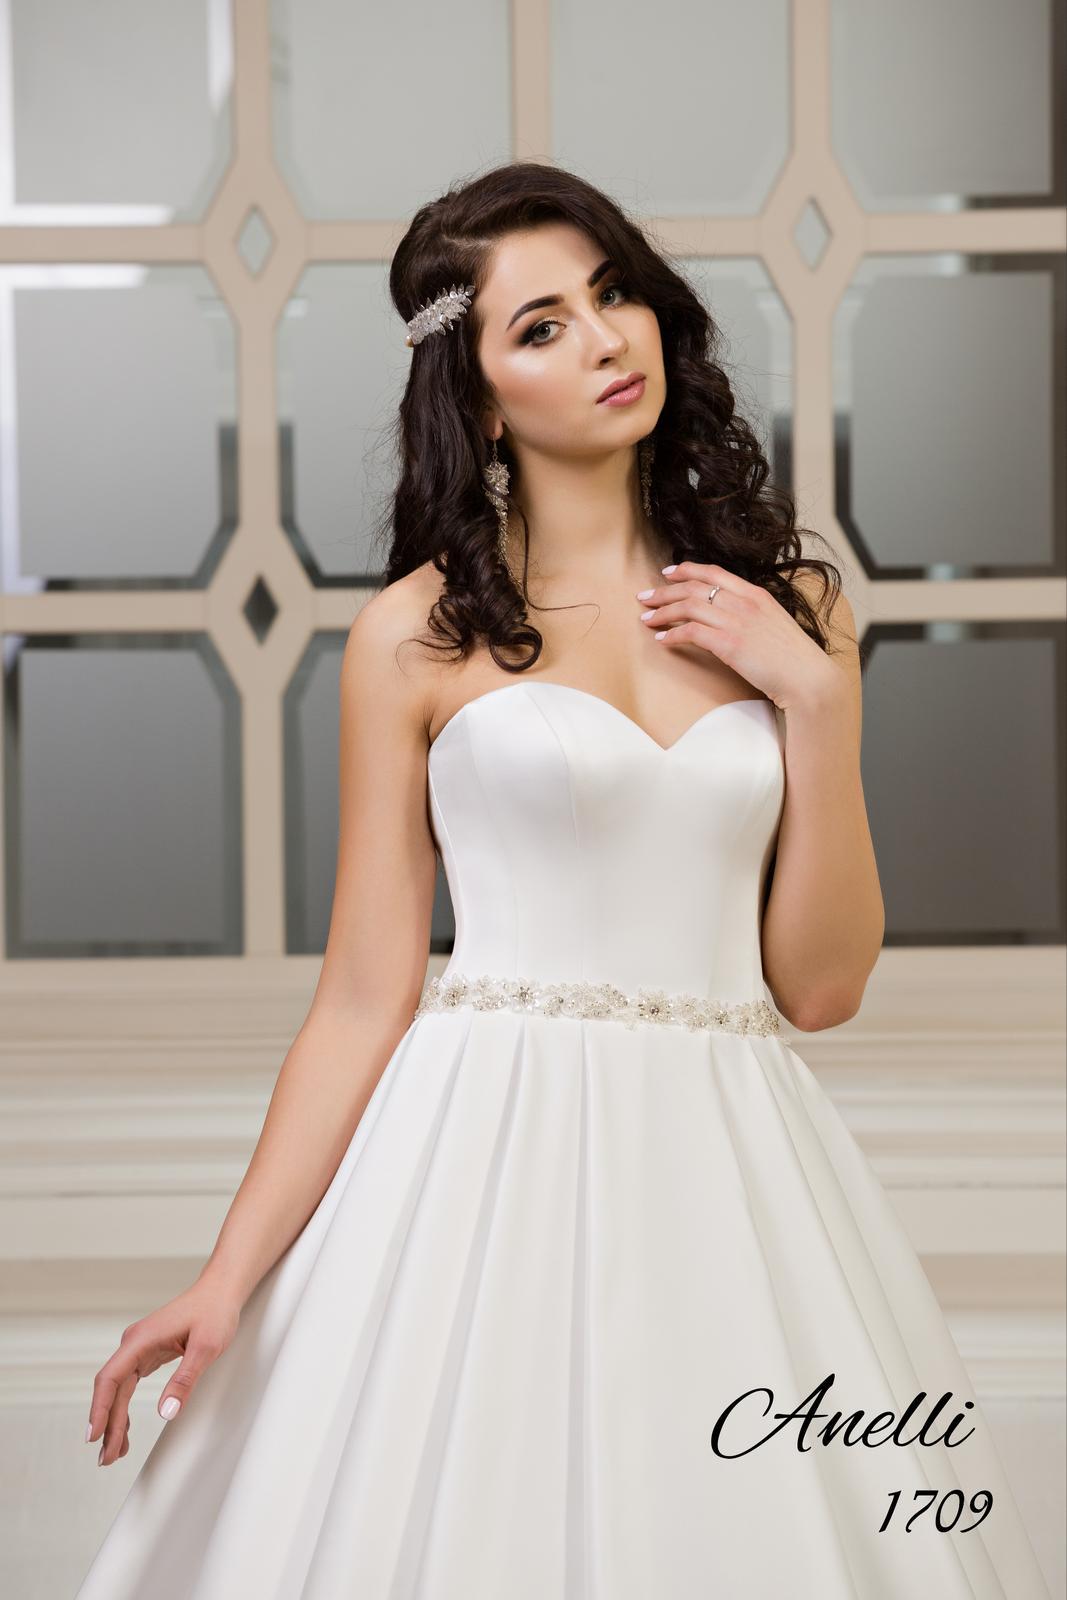 Svadobné šaty - Debut 1709 - Obrázok č. 2